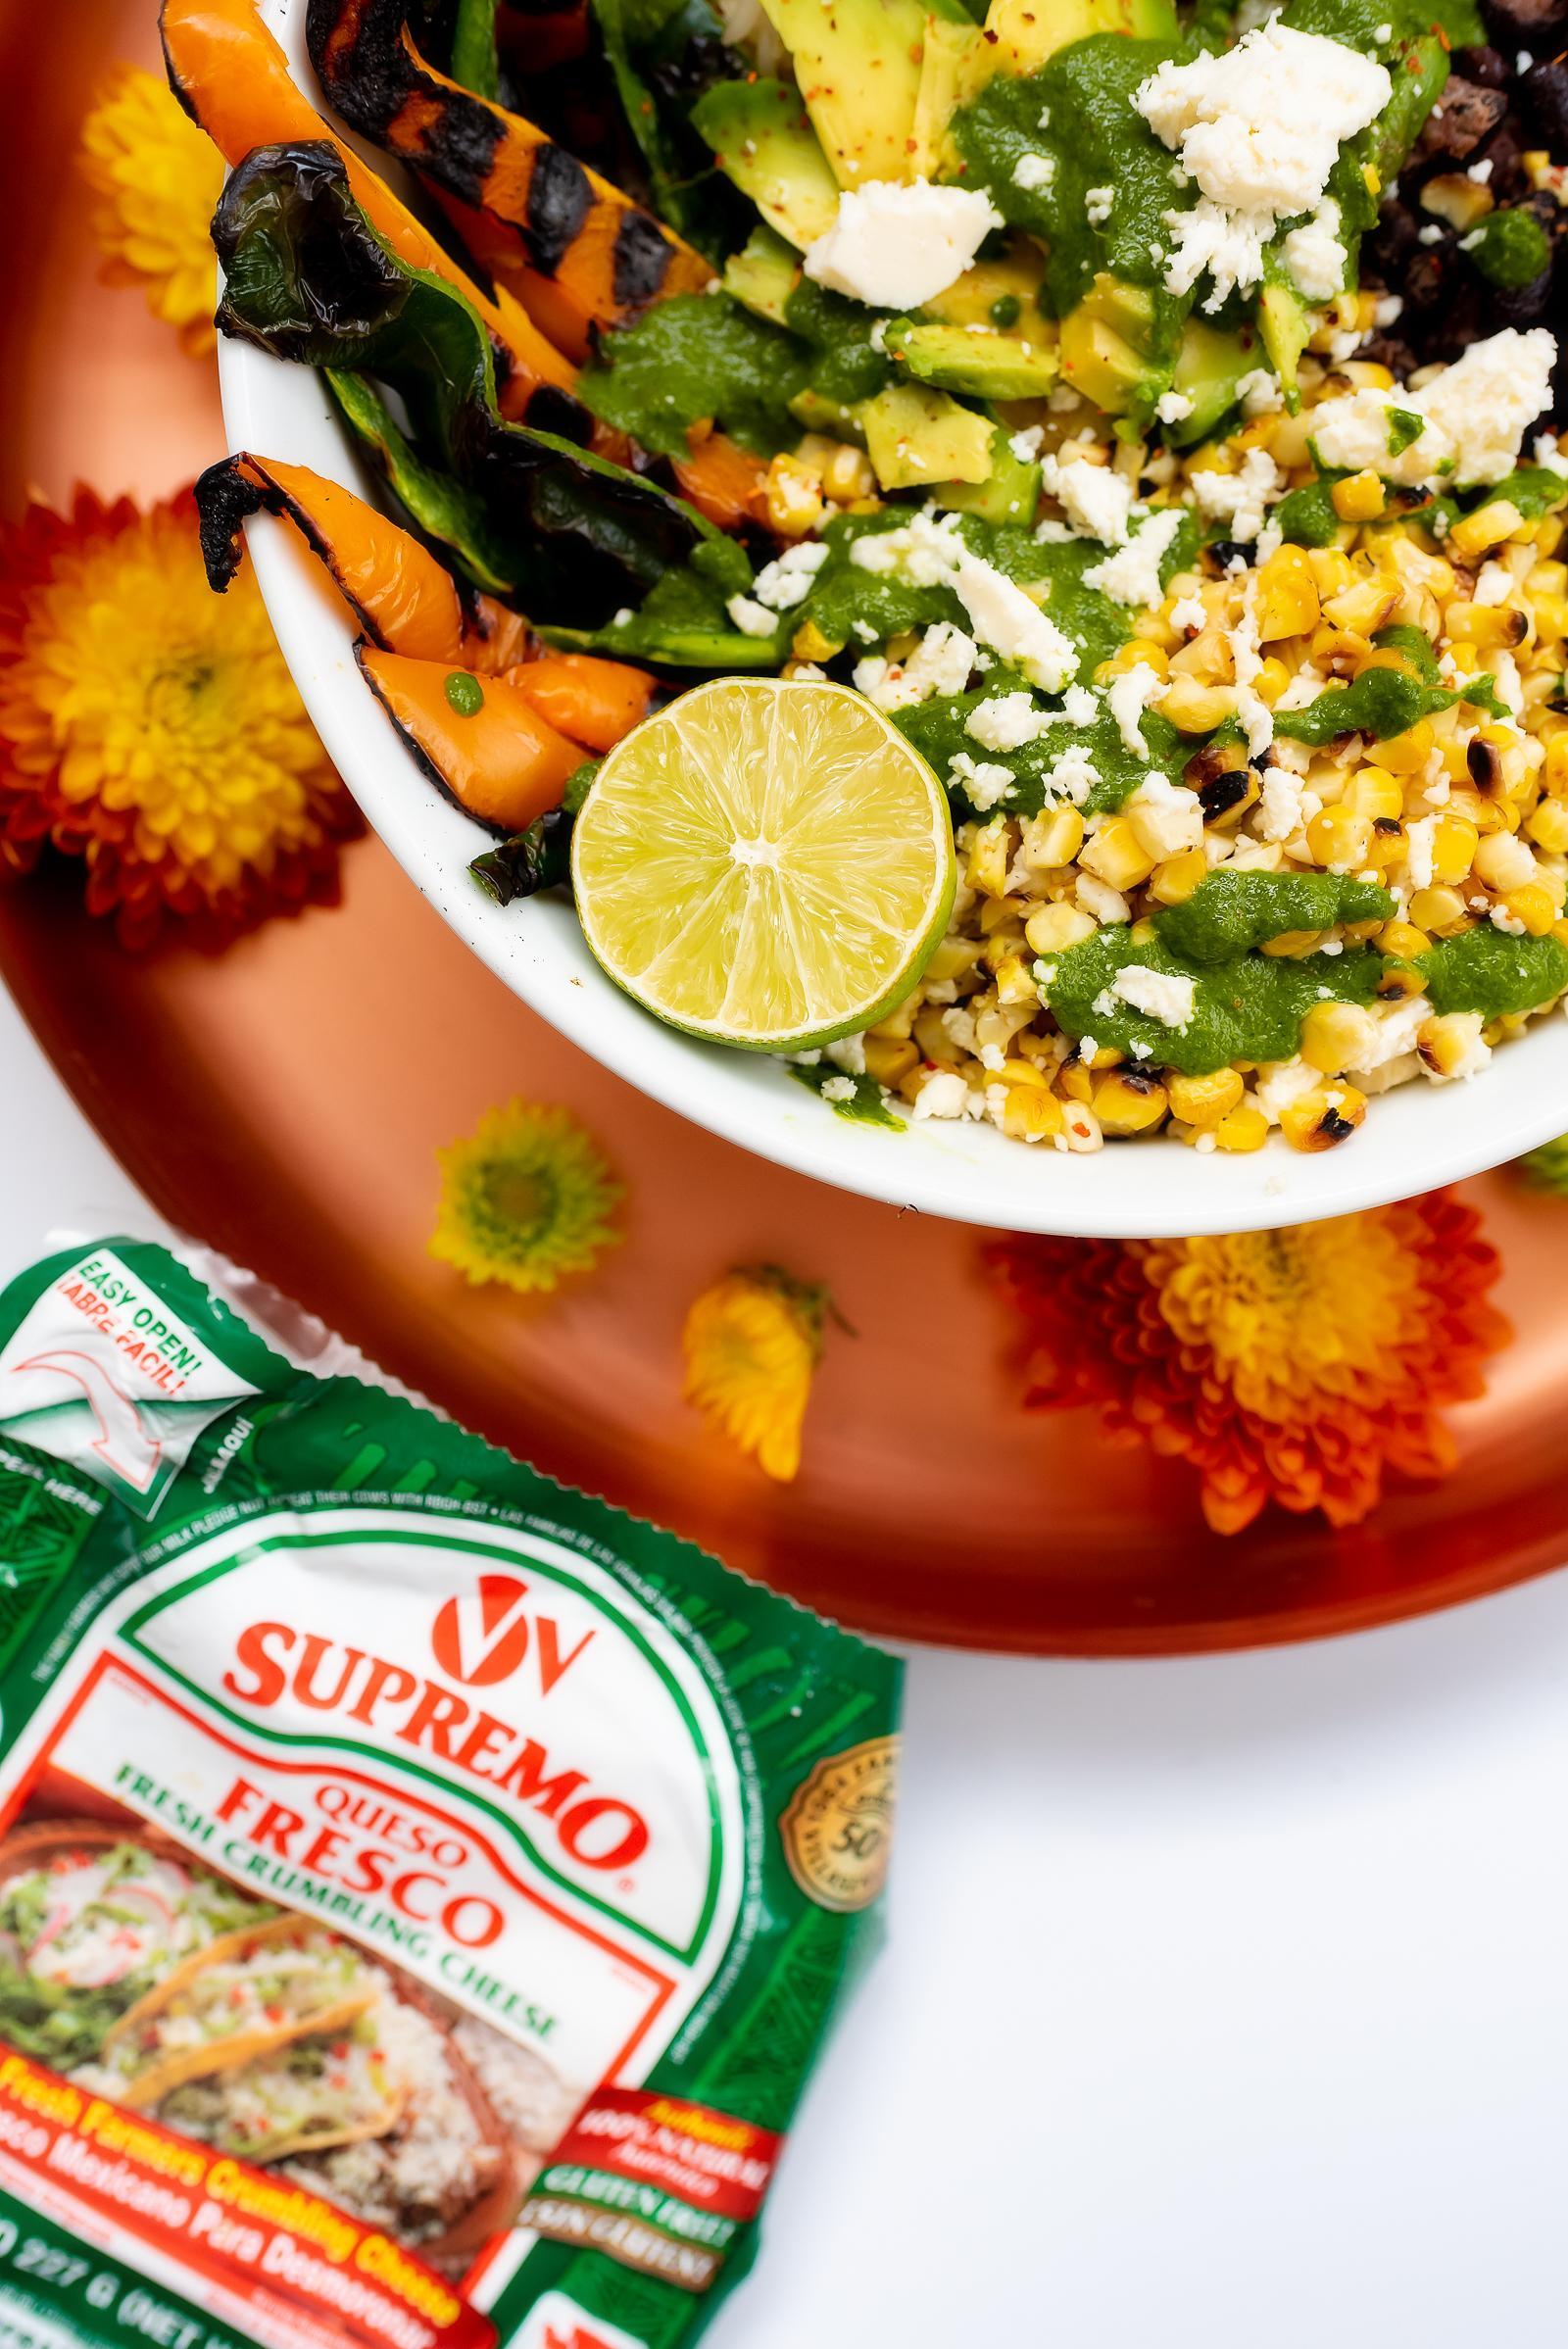 Poblano & Elotes Burrito Bowl Recipe with V&V Supremo